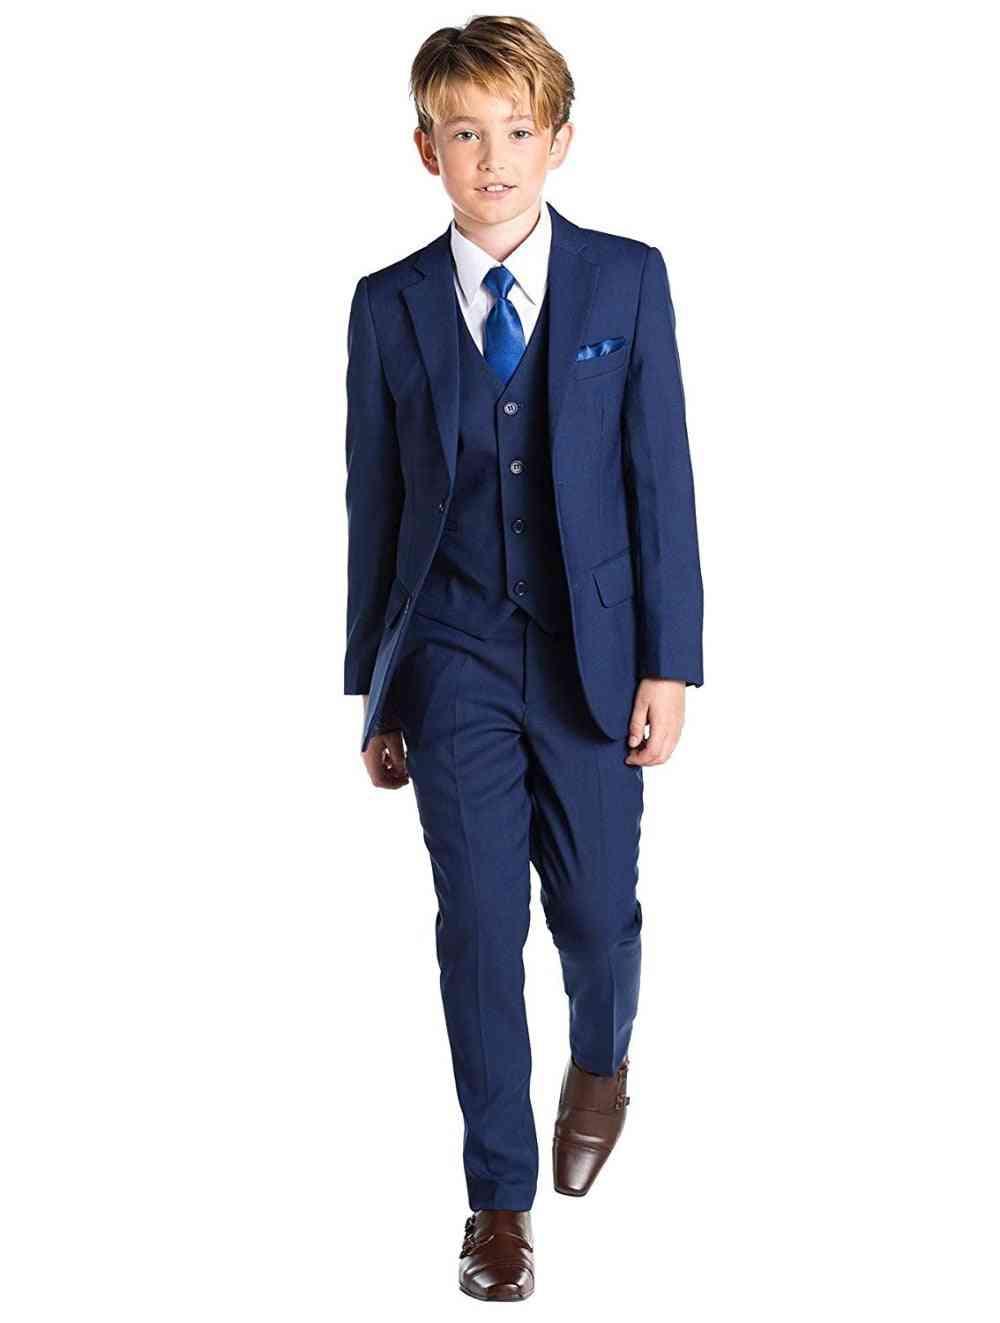 Boy's Suits, Tuxedo Fist Communication Party Wear